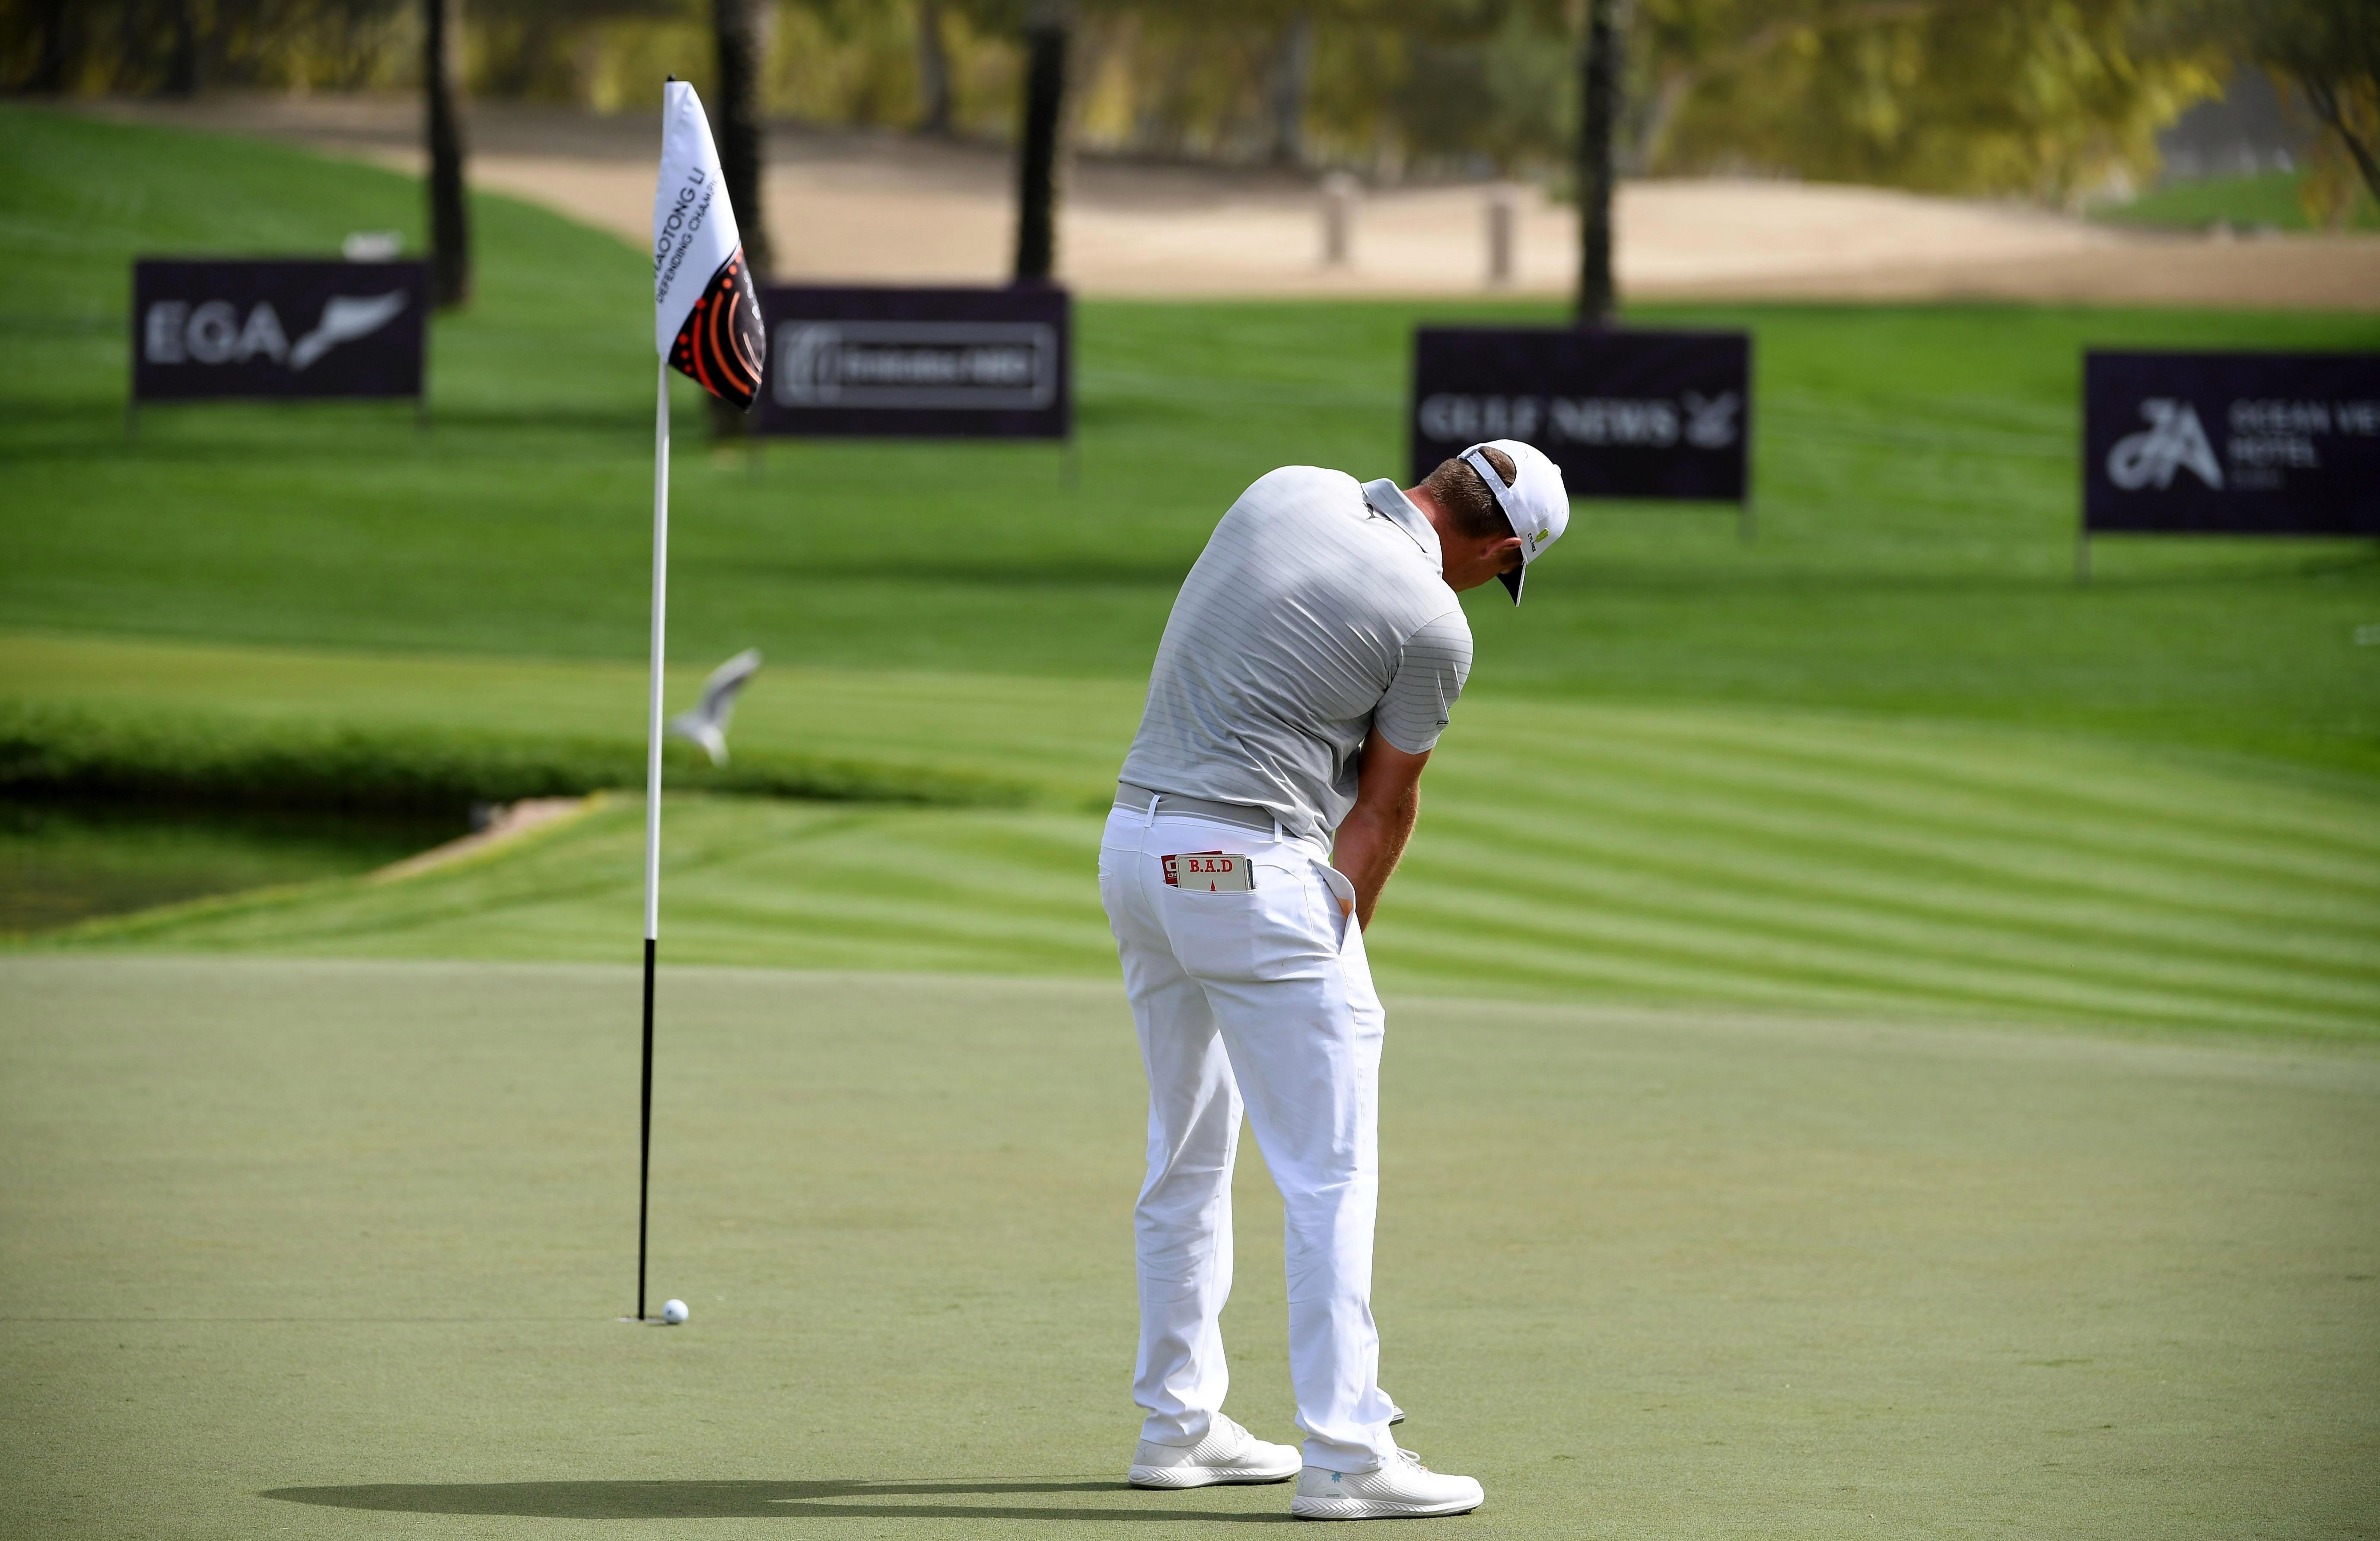 Bryson DeChambeau leaves the flagstick in on any putt longer than ten feet